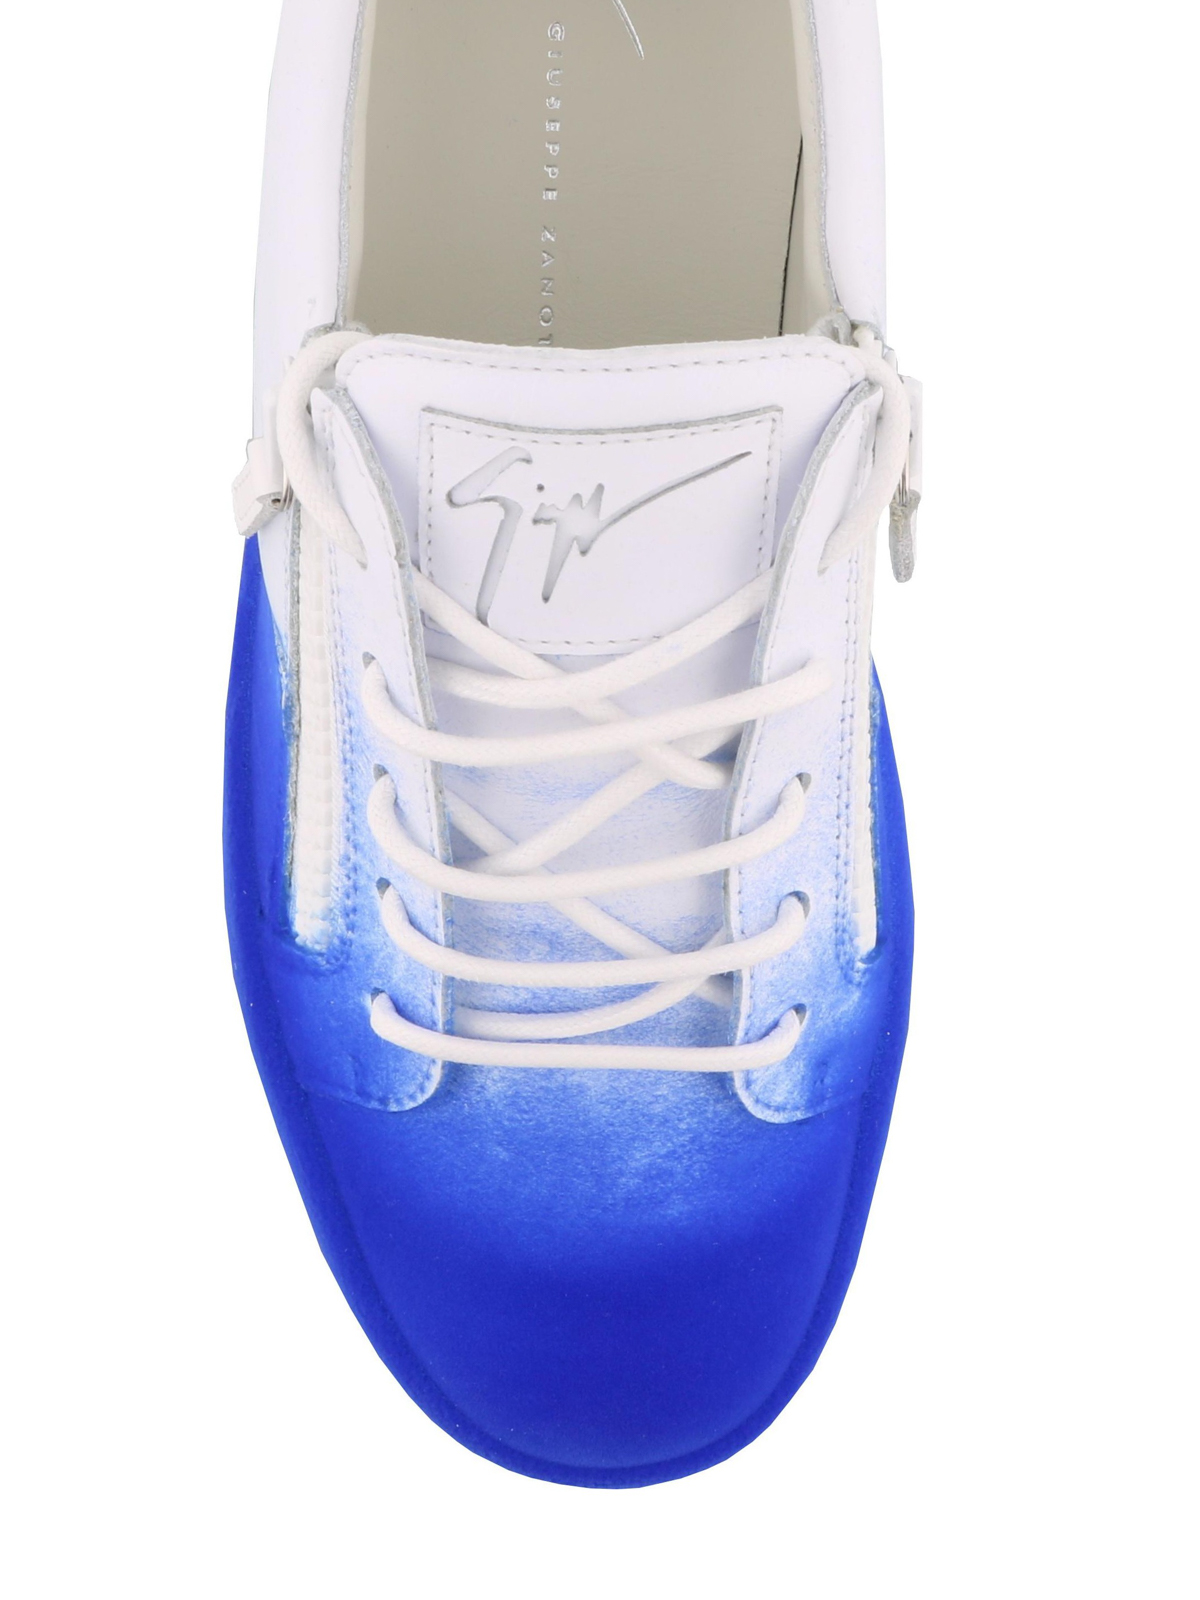 1c727e93372f5 iKRIX GIUSEPPE ZANOTTI: trainers - New Unfinished blue coated sneakers